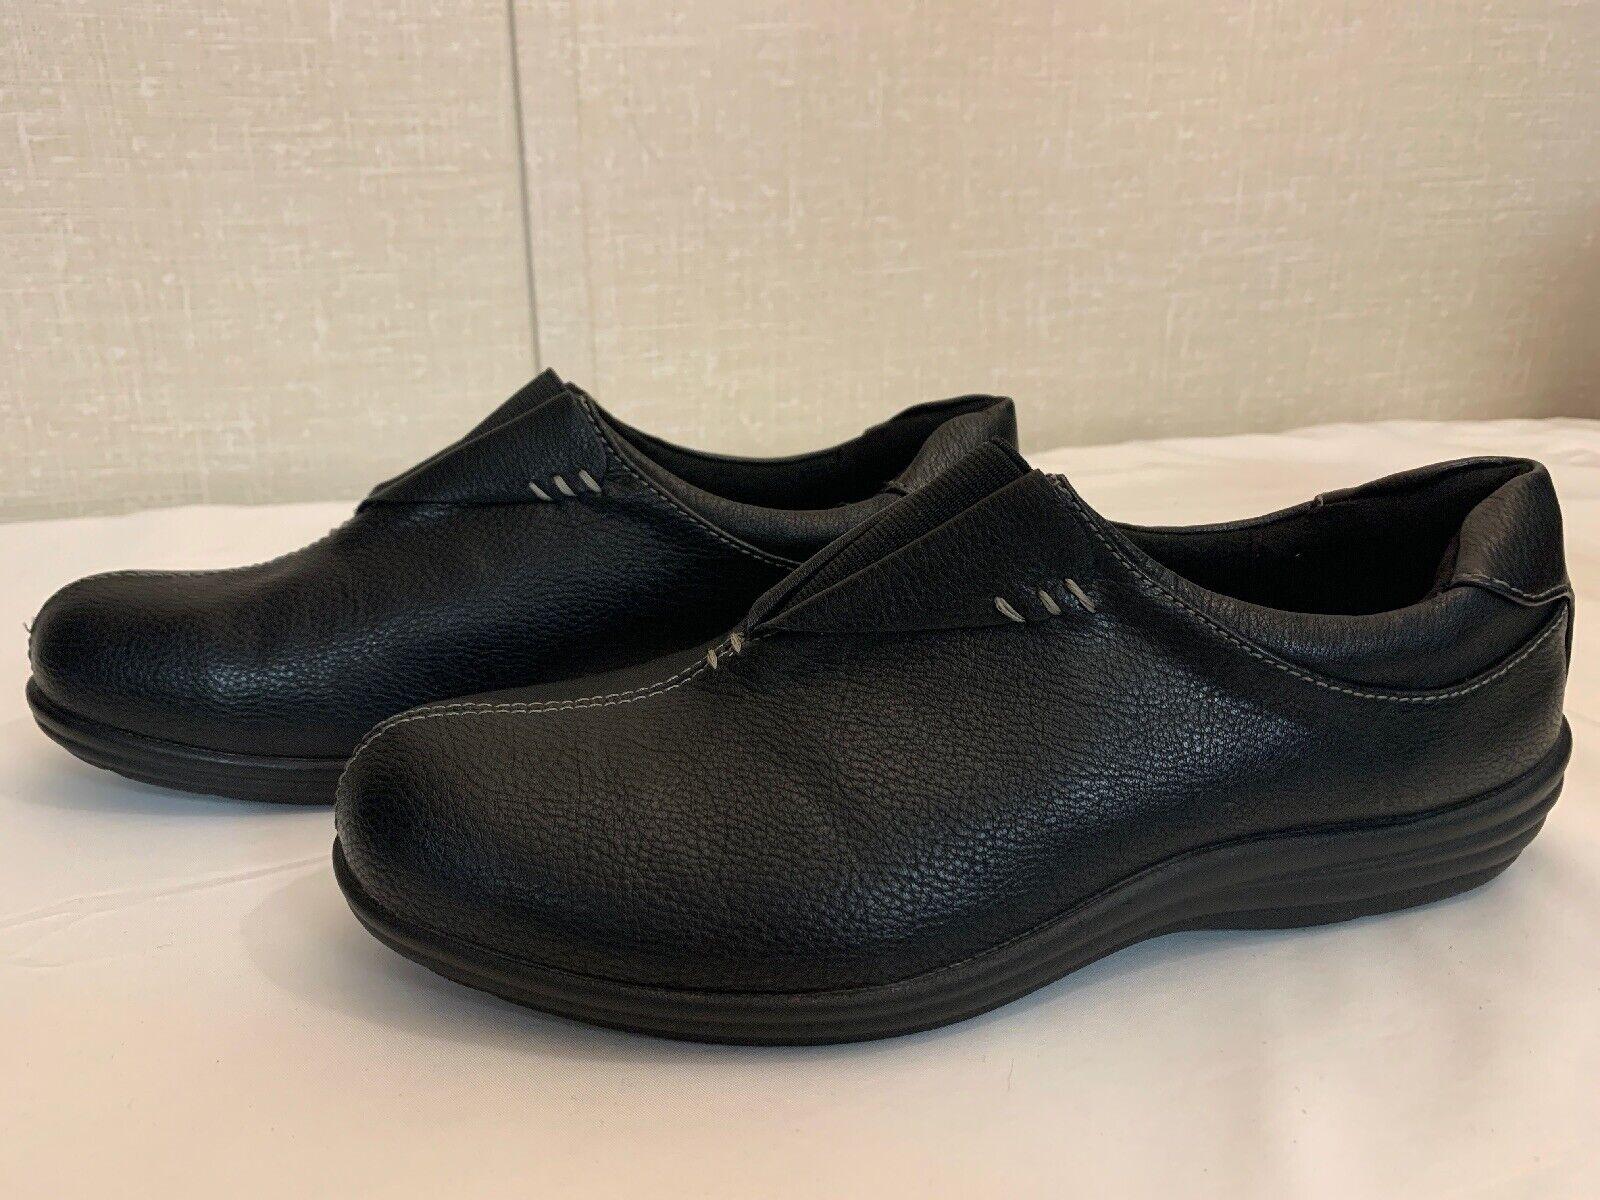 New W Tags Croft & Barrow Women's Black Ortholite Comfort Shoes Size 91/2 Medium